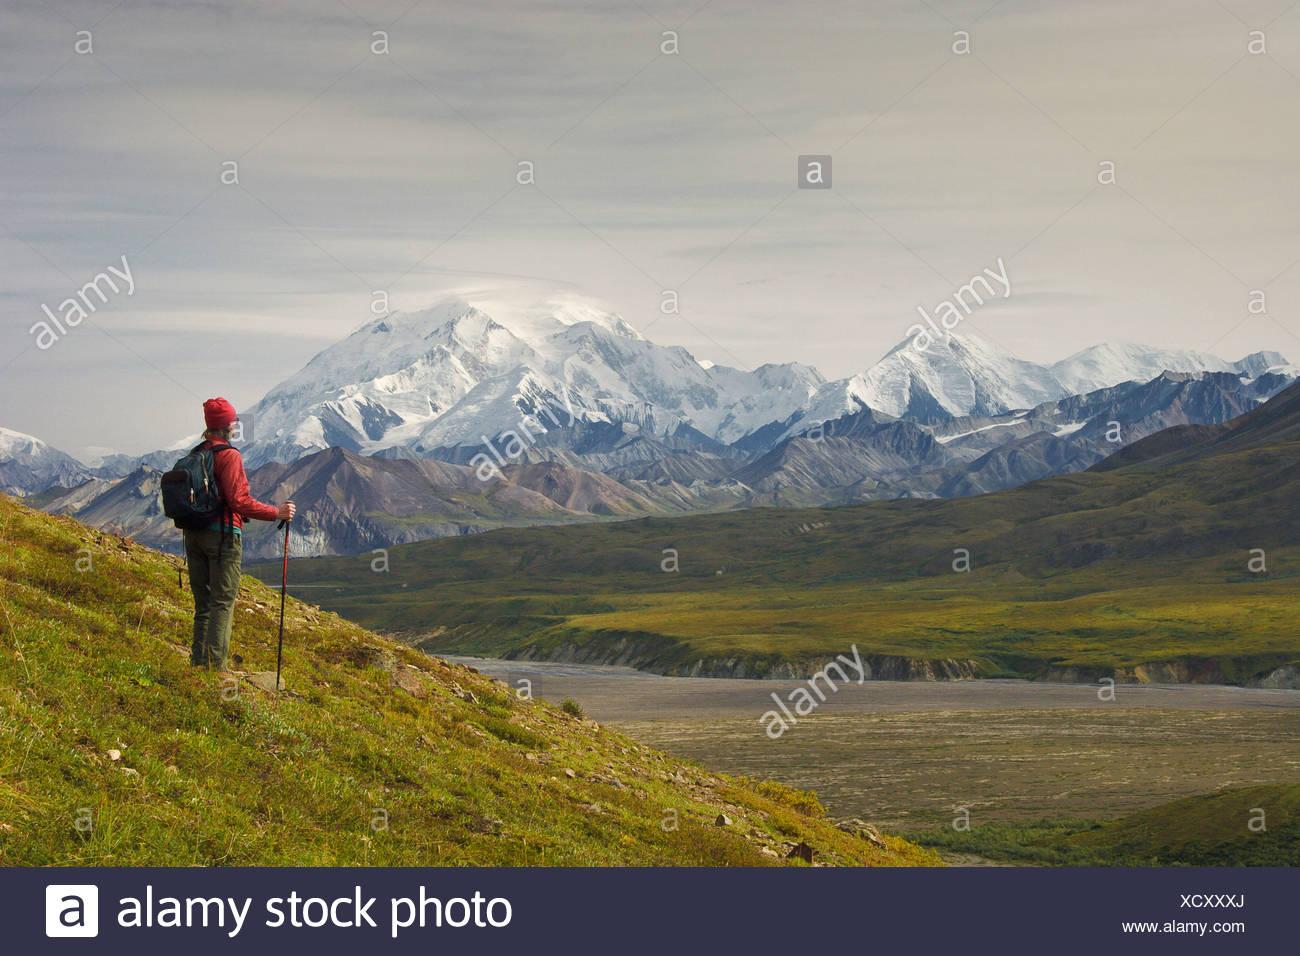 Female hiker views Mt. McKinley in Denali National Park, near Eielson Visitors Center, Alaska, Fall Stock Photo